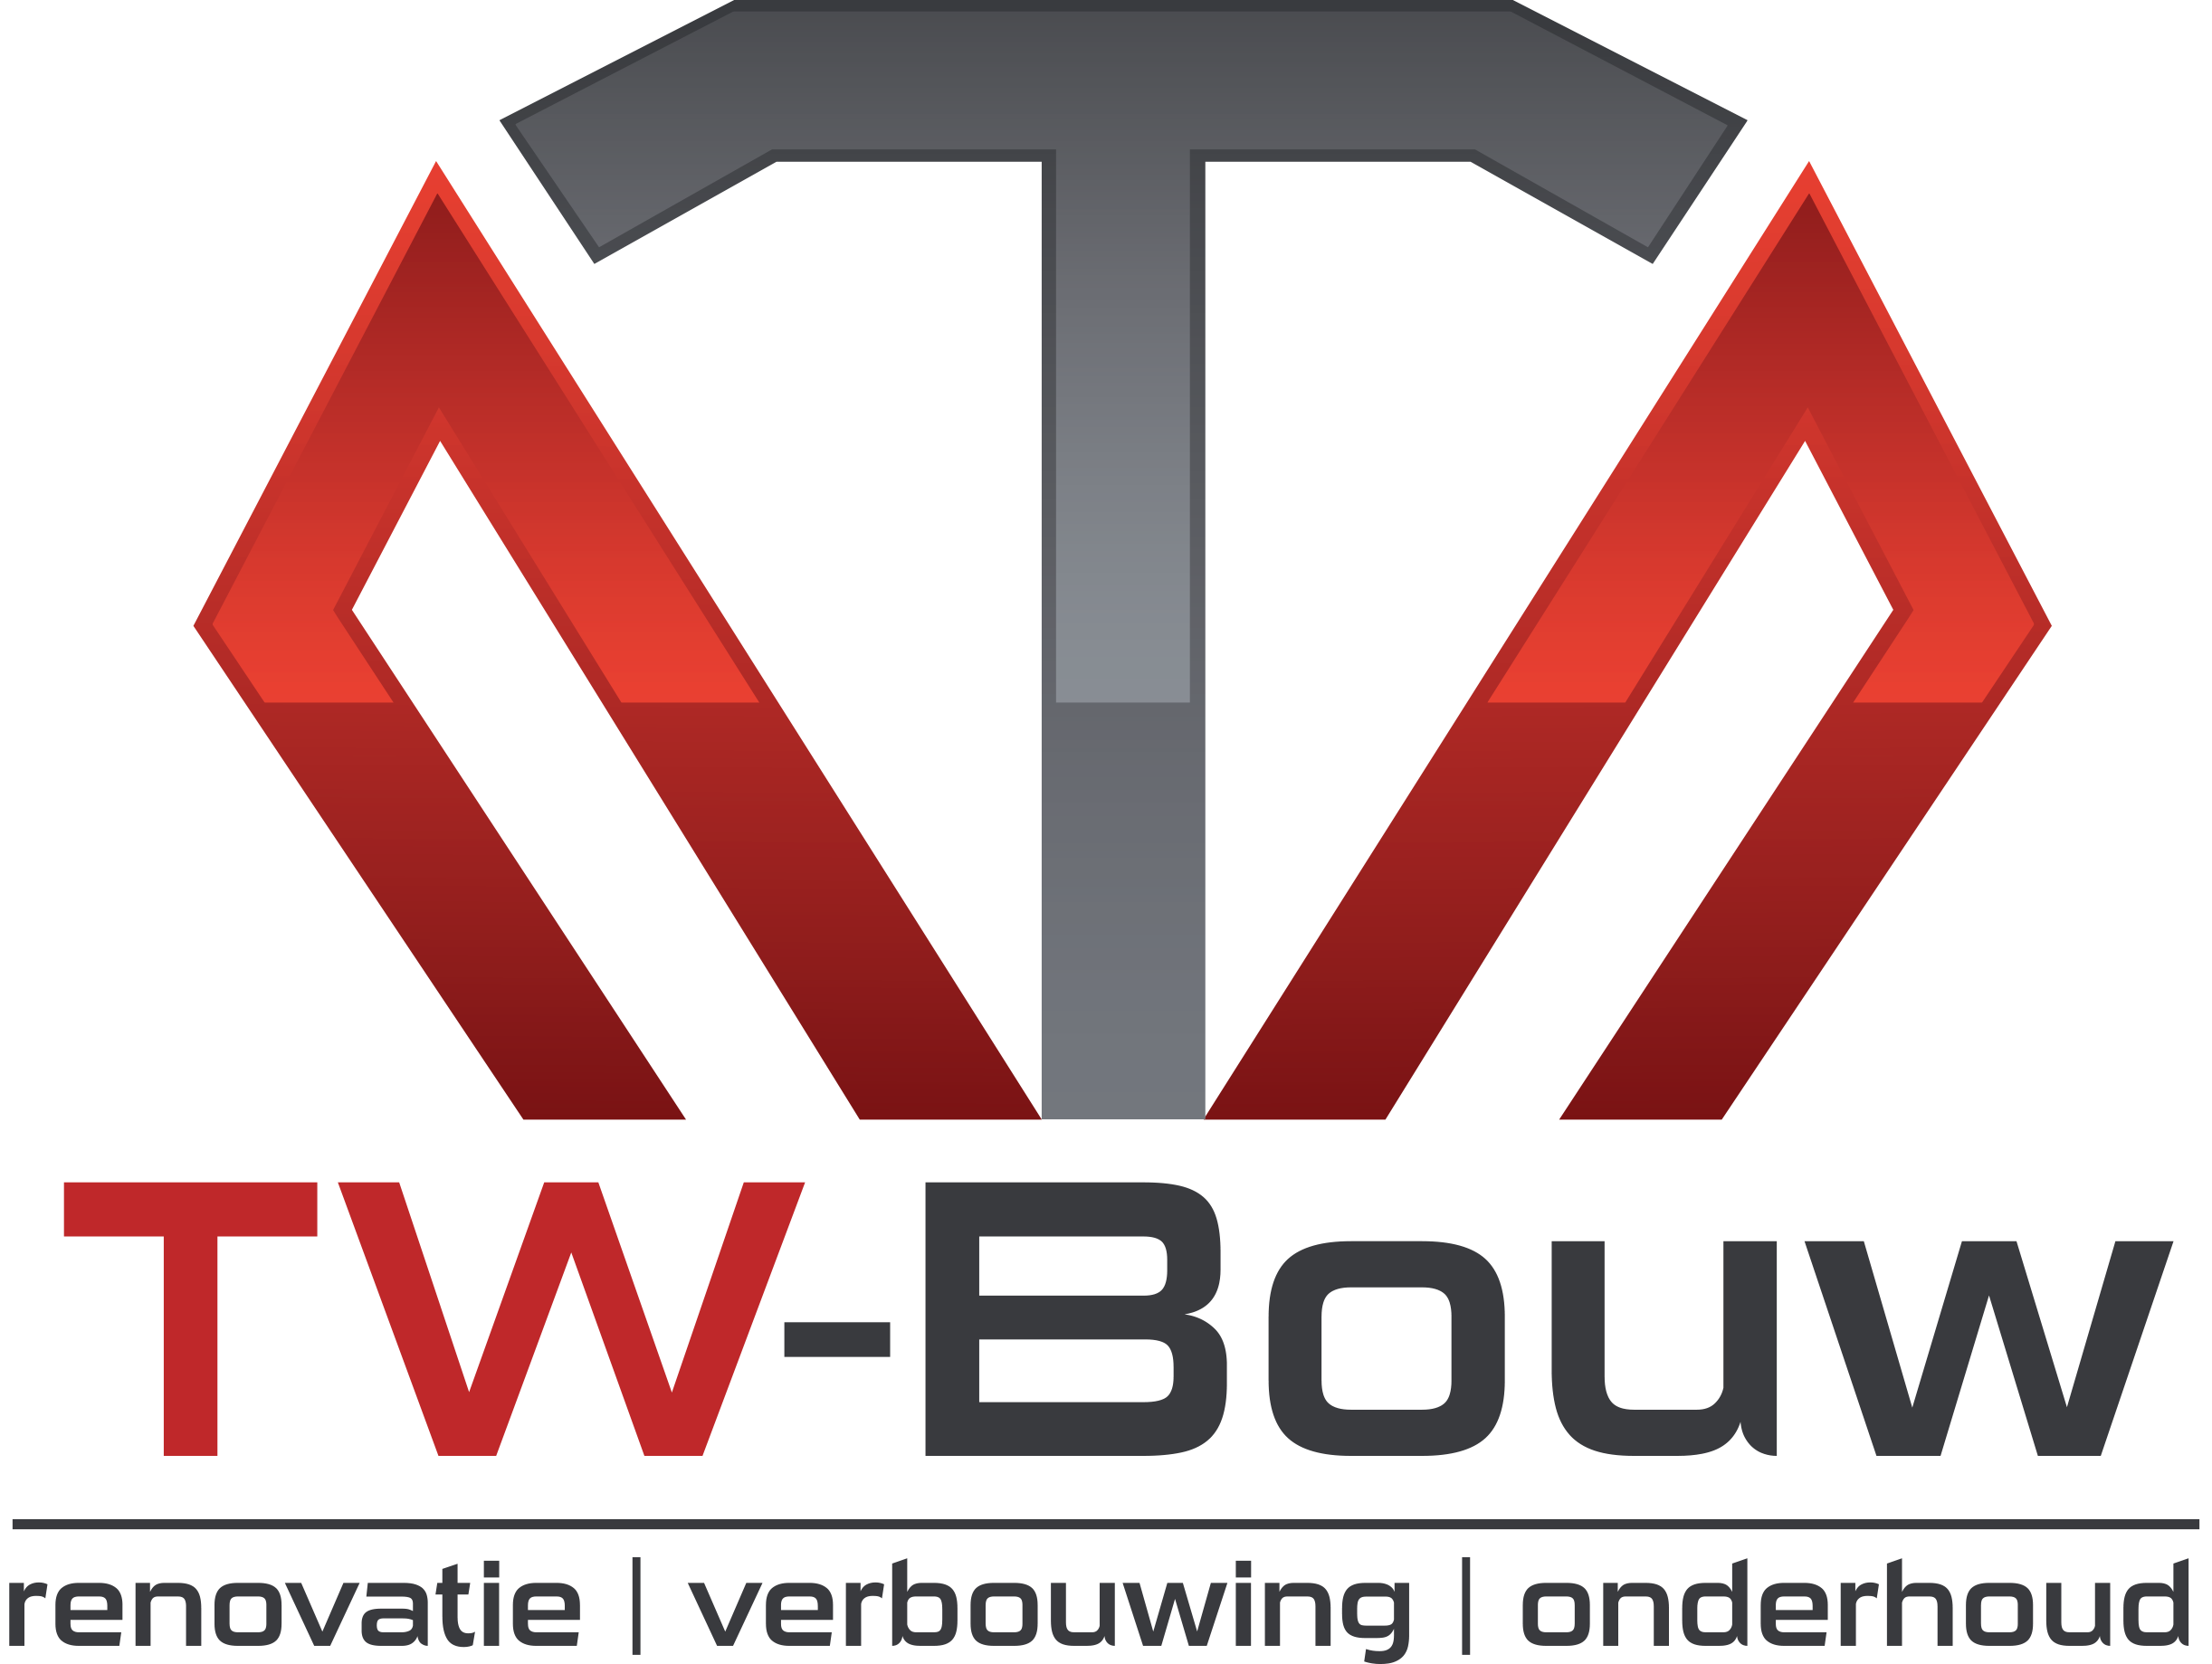 TW Bouw logo